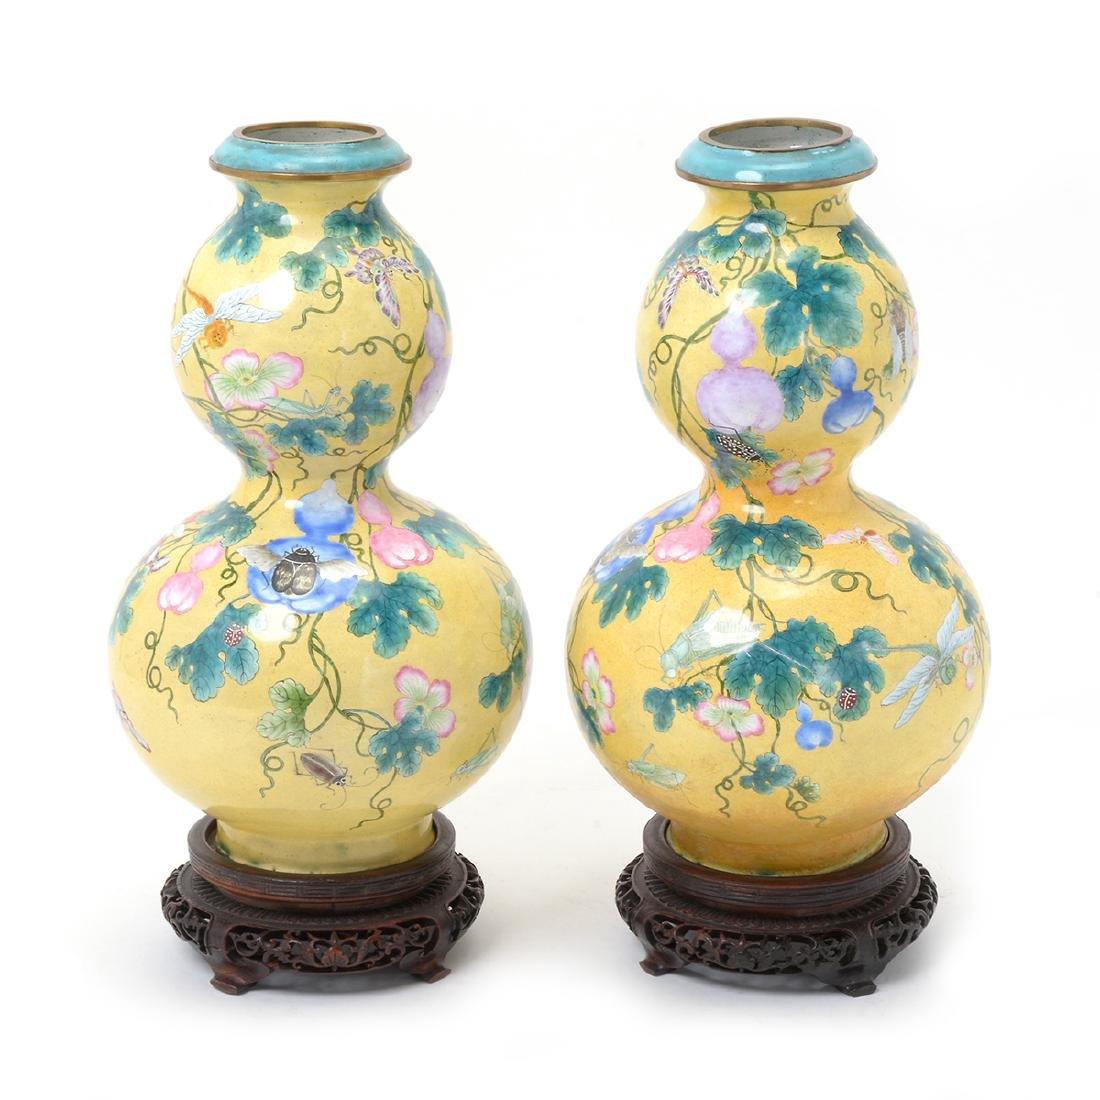 Pr of Canton Enamel Double Gourd Vases, 18th/19th C.